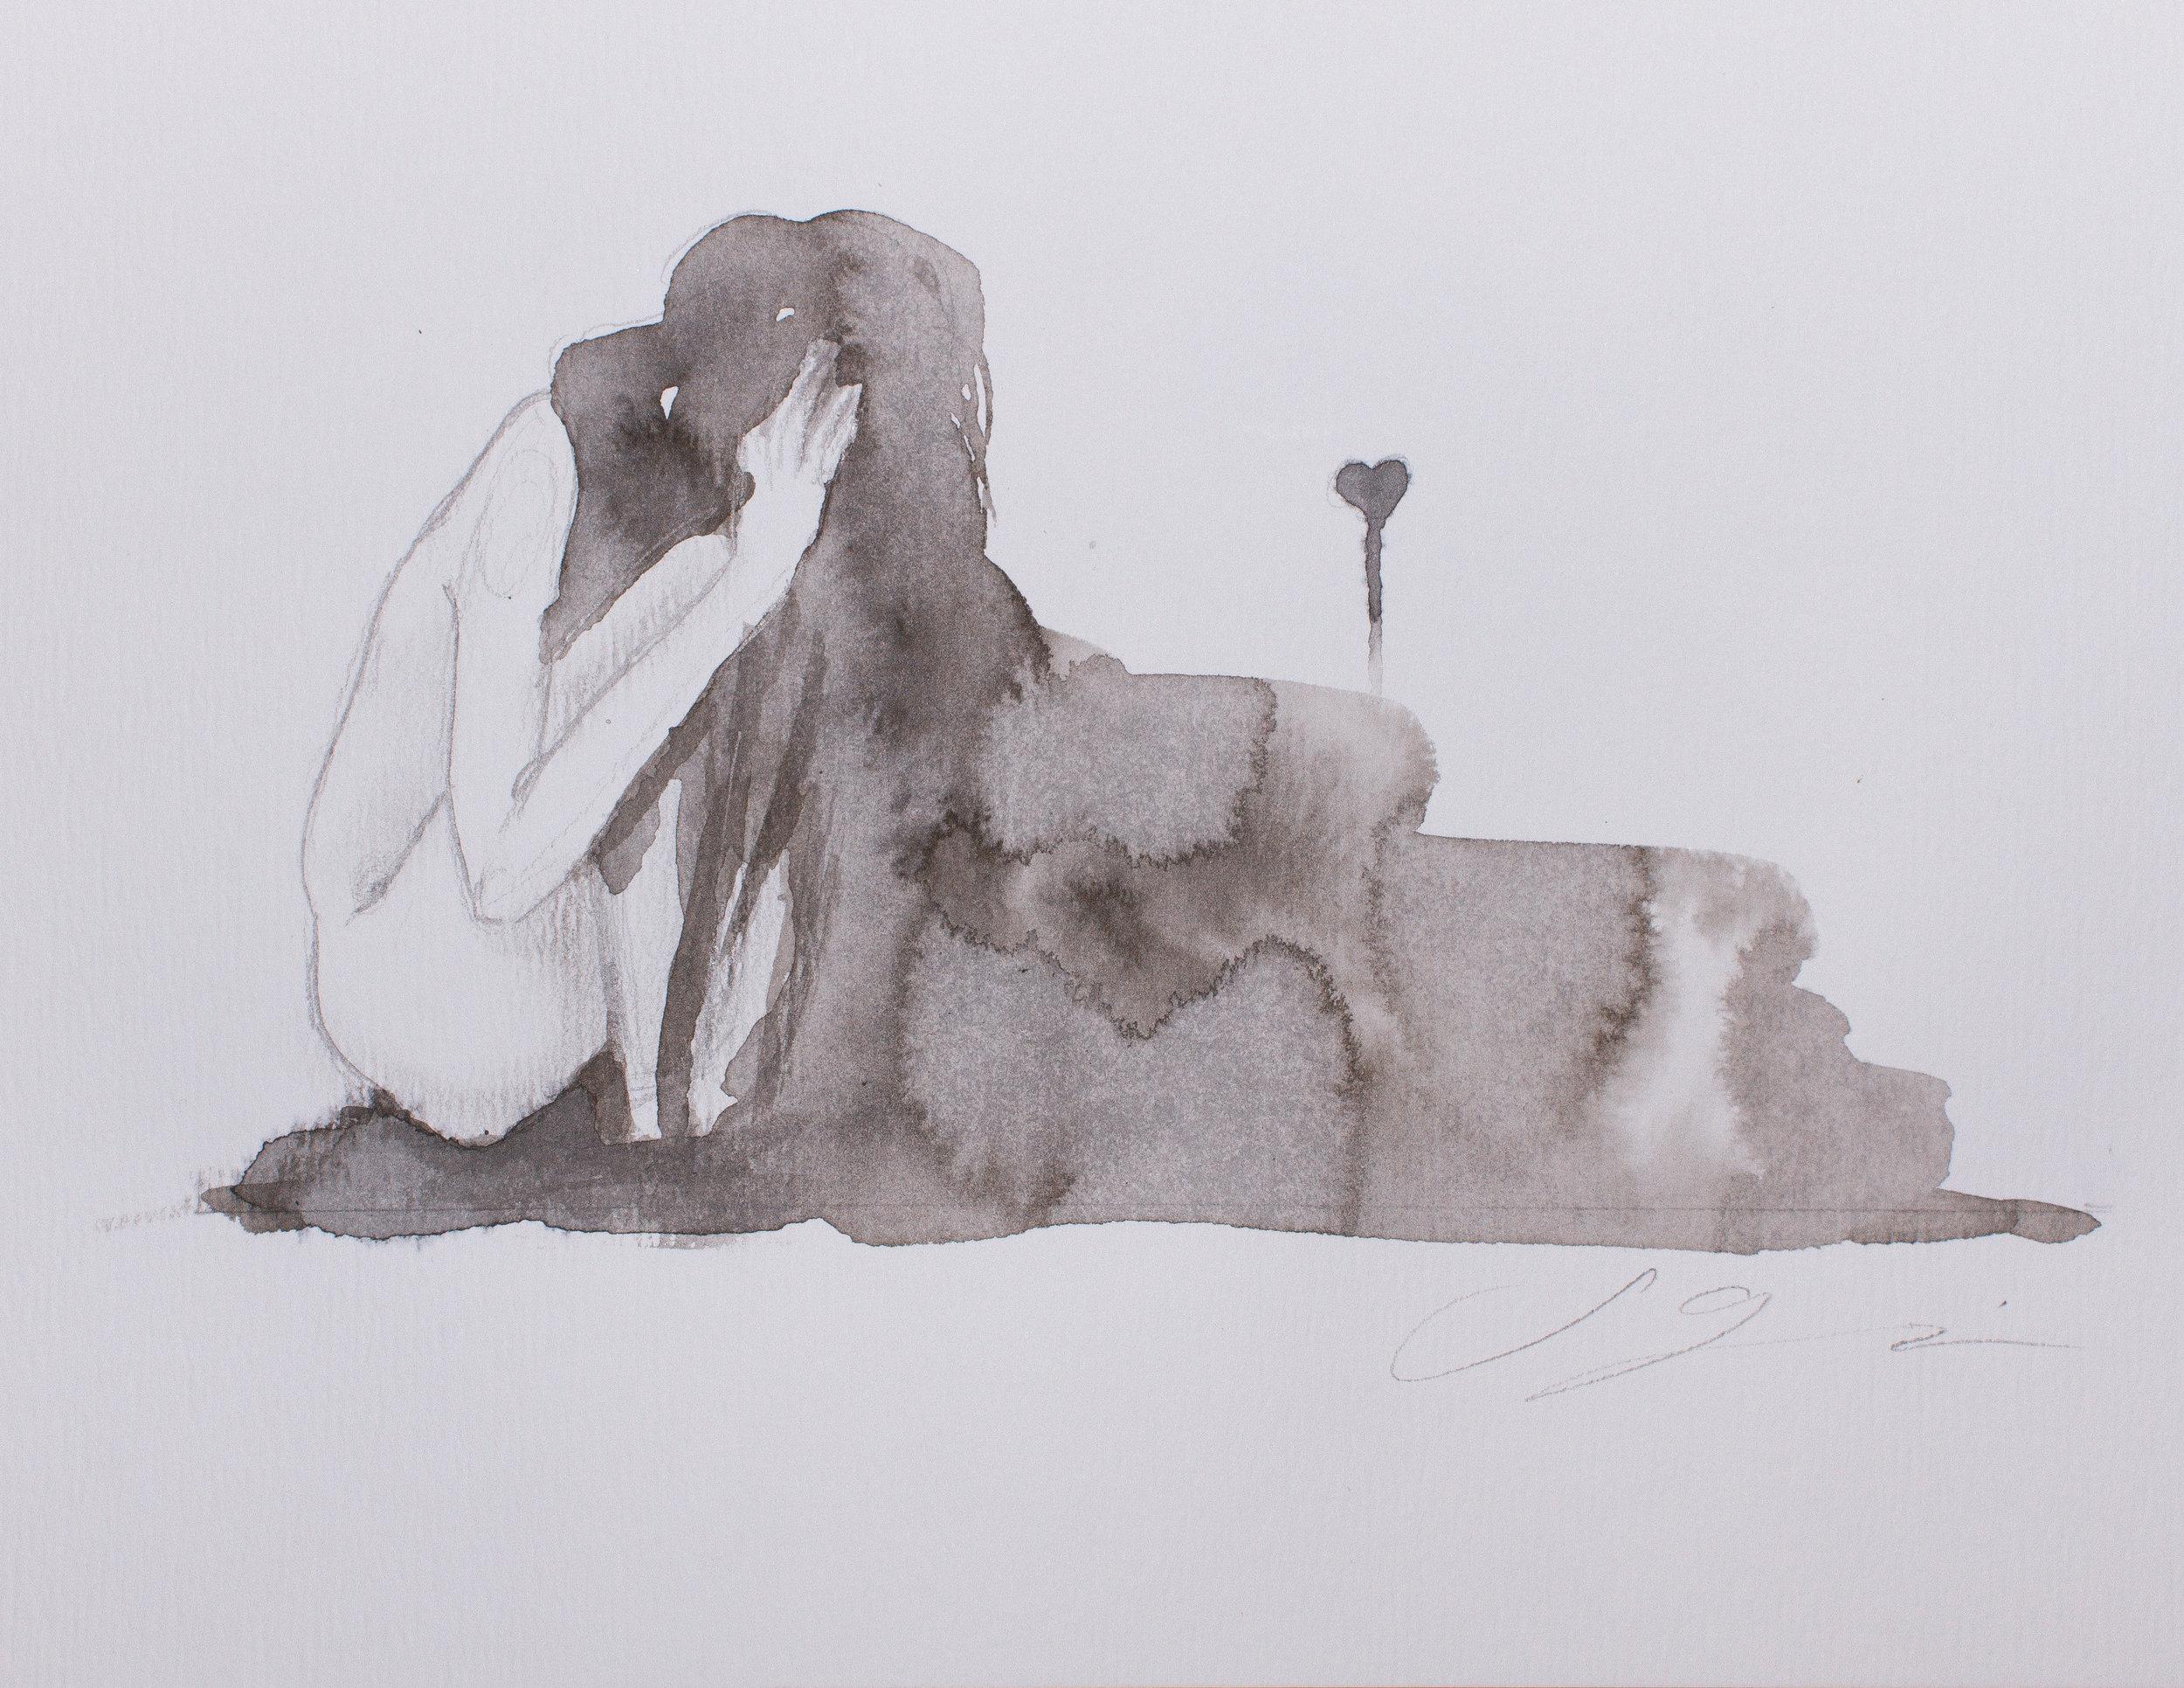 """Alone"" Illustrated by Sam Guzzie"